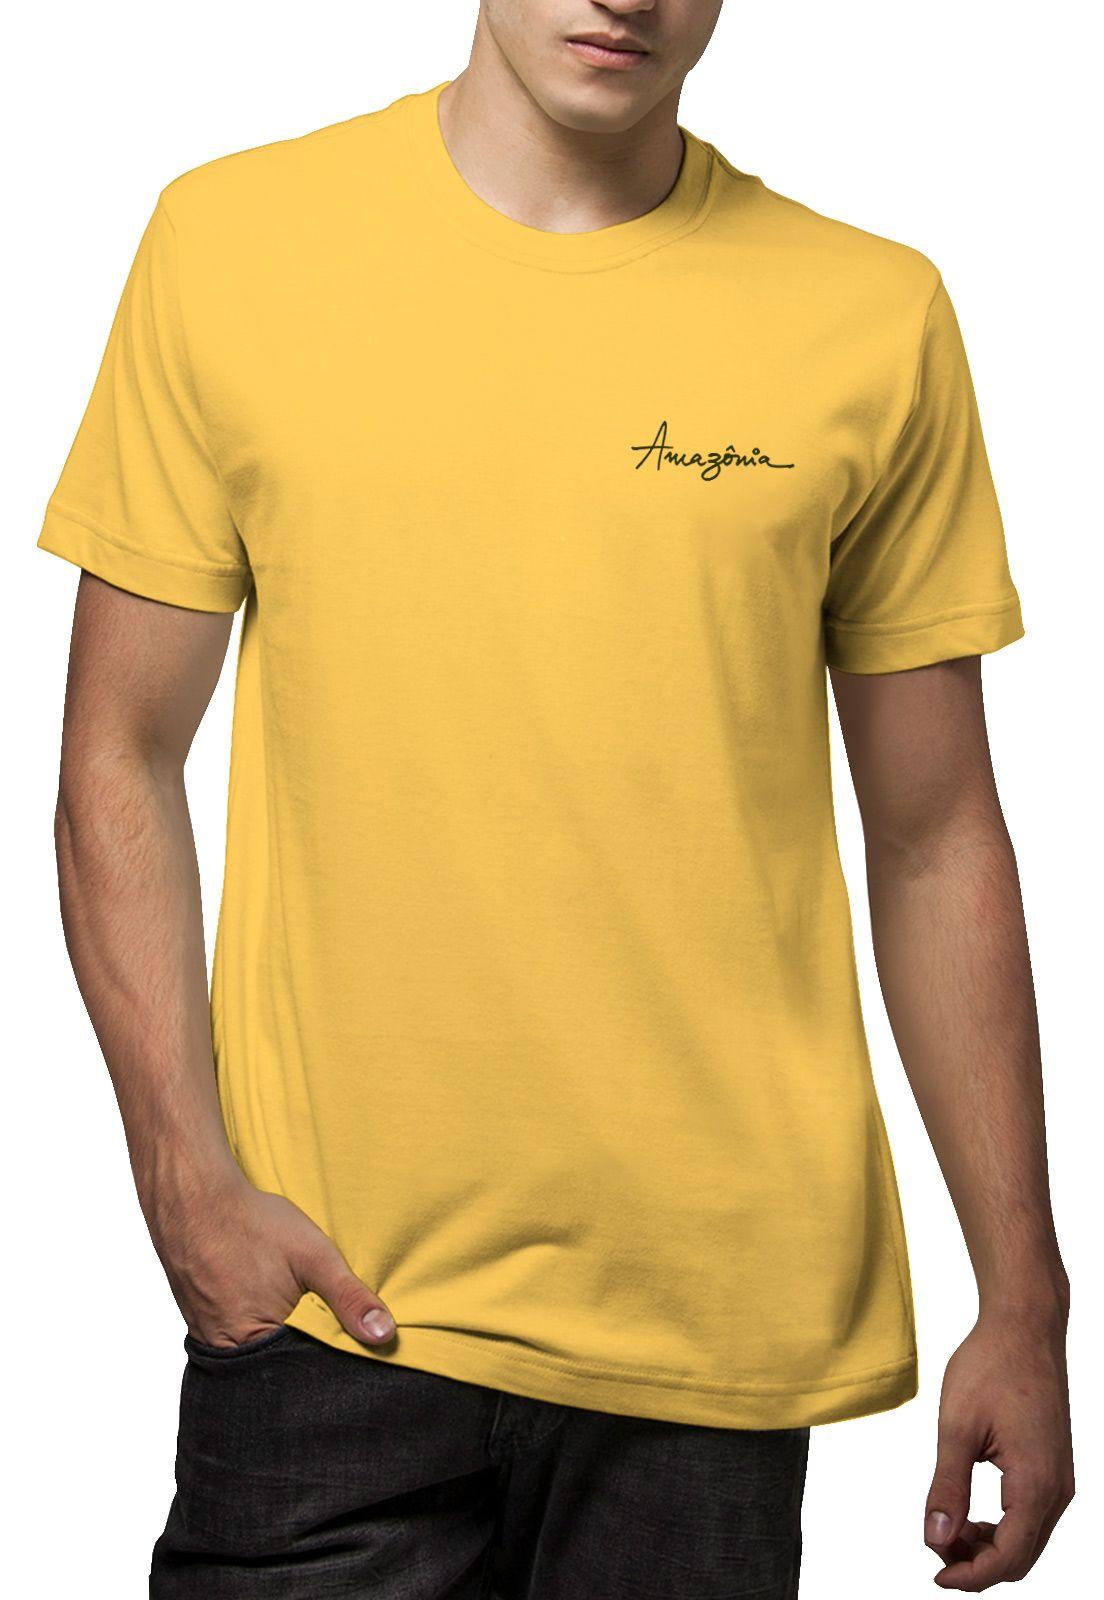 Camiseta Amazônia Girassol - Amarelo